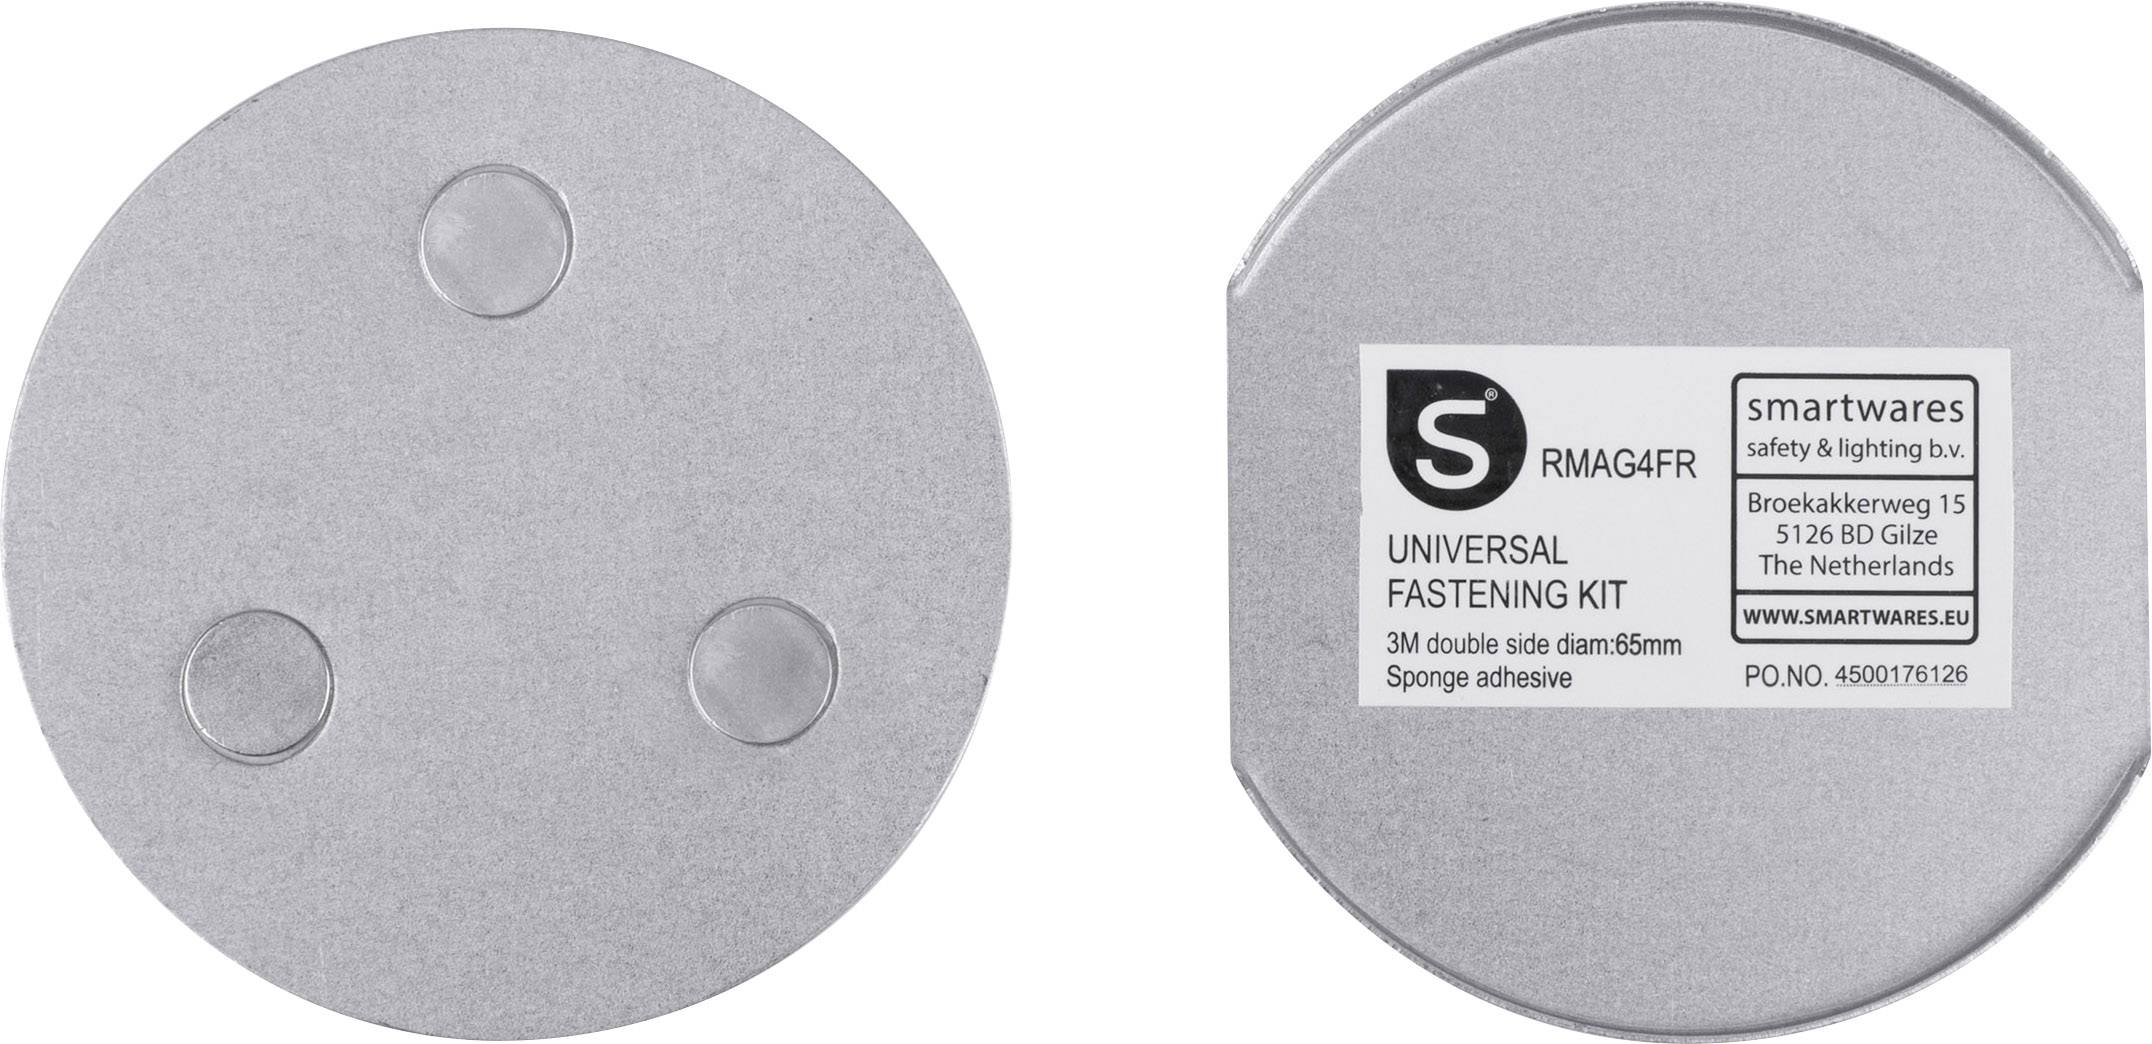 Magnetický držák detektoru kouře Smartwares RMAG4